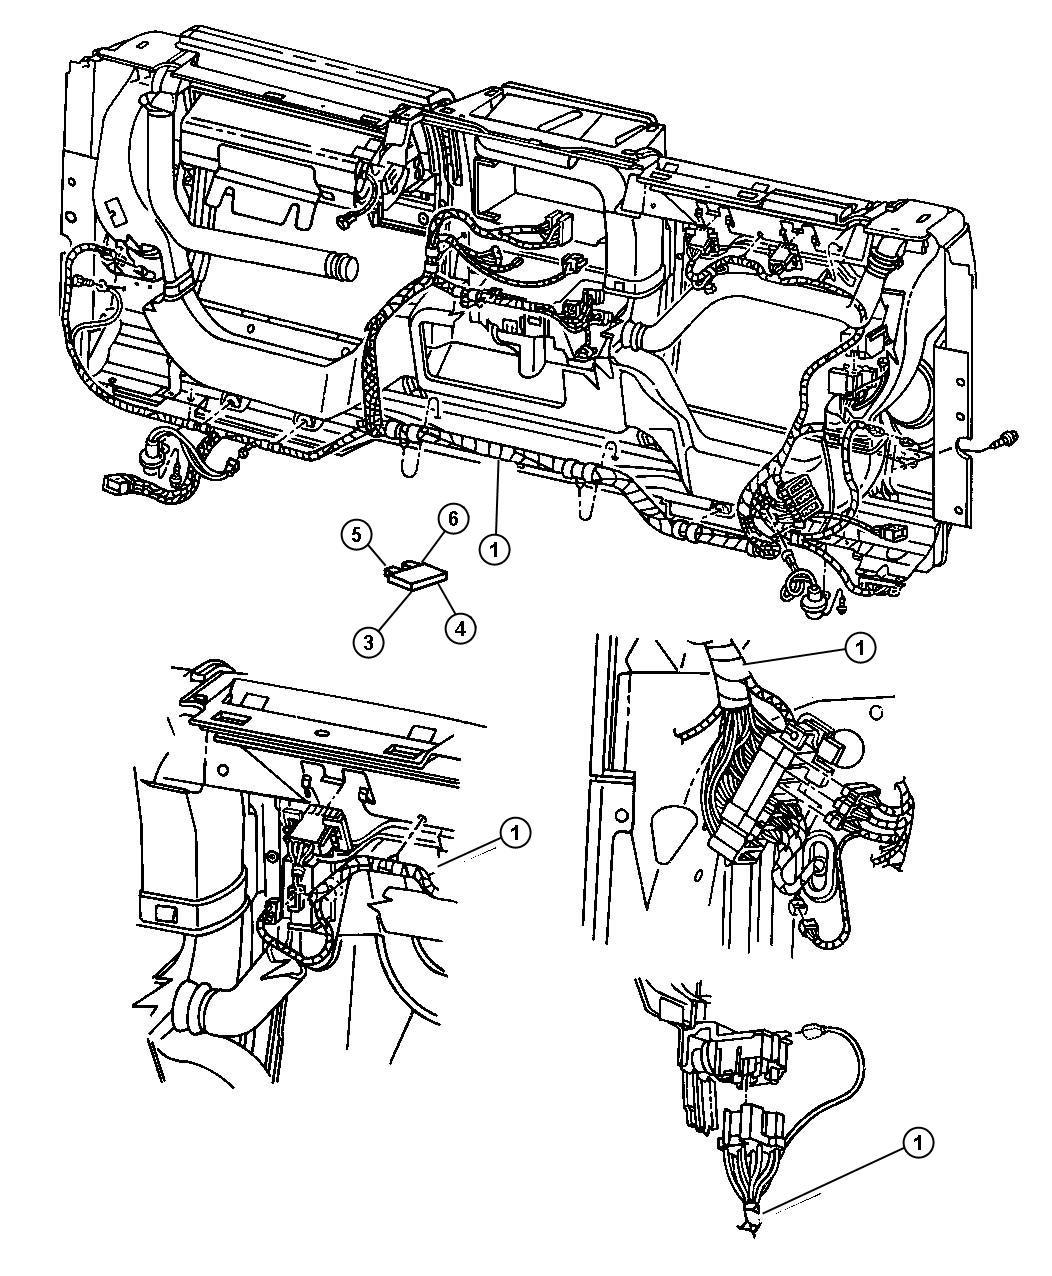 2002 Jeep Wrangler Flasher. Hazard flasher, hazard warning